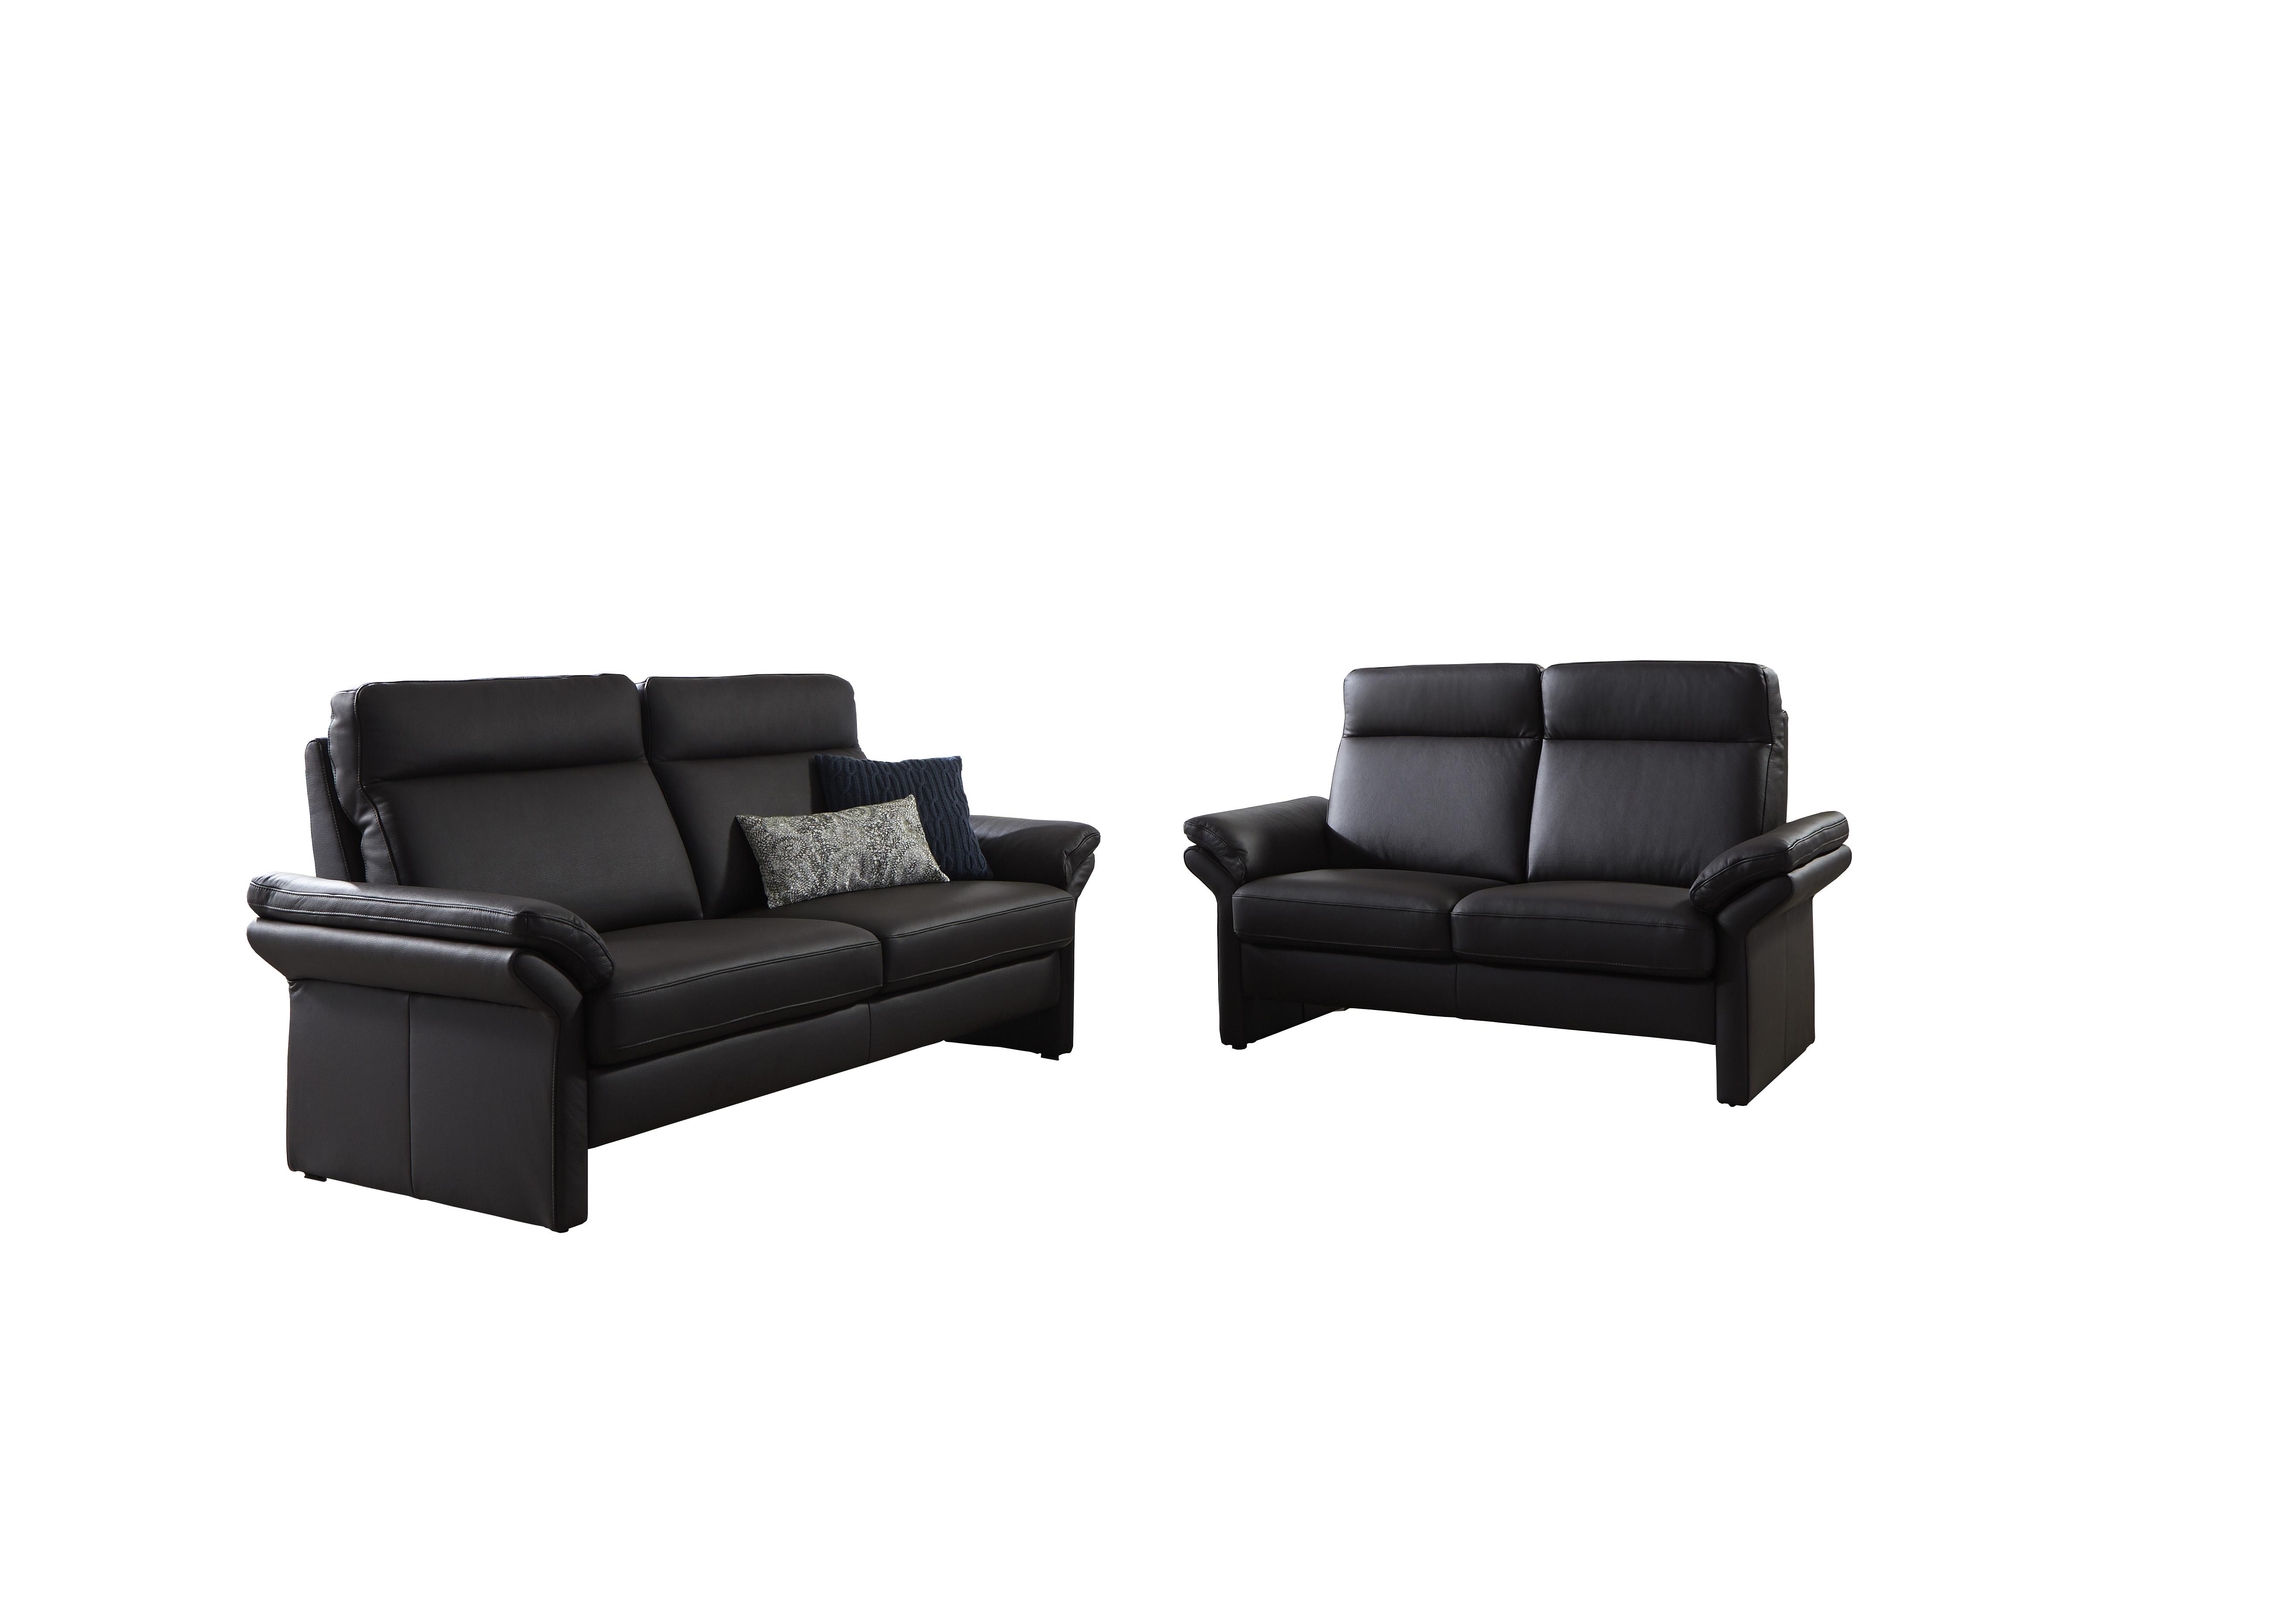 carina madeira polsterm. Black Bedroom Furniture Sets. Home Design Ideas